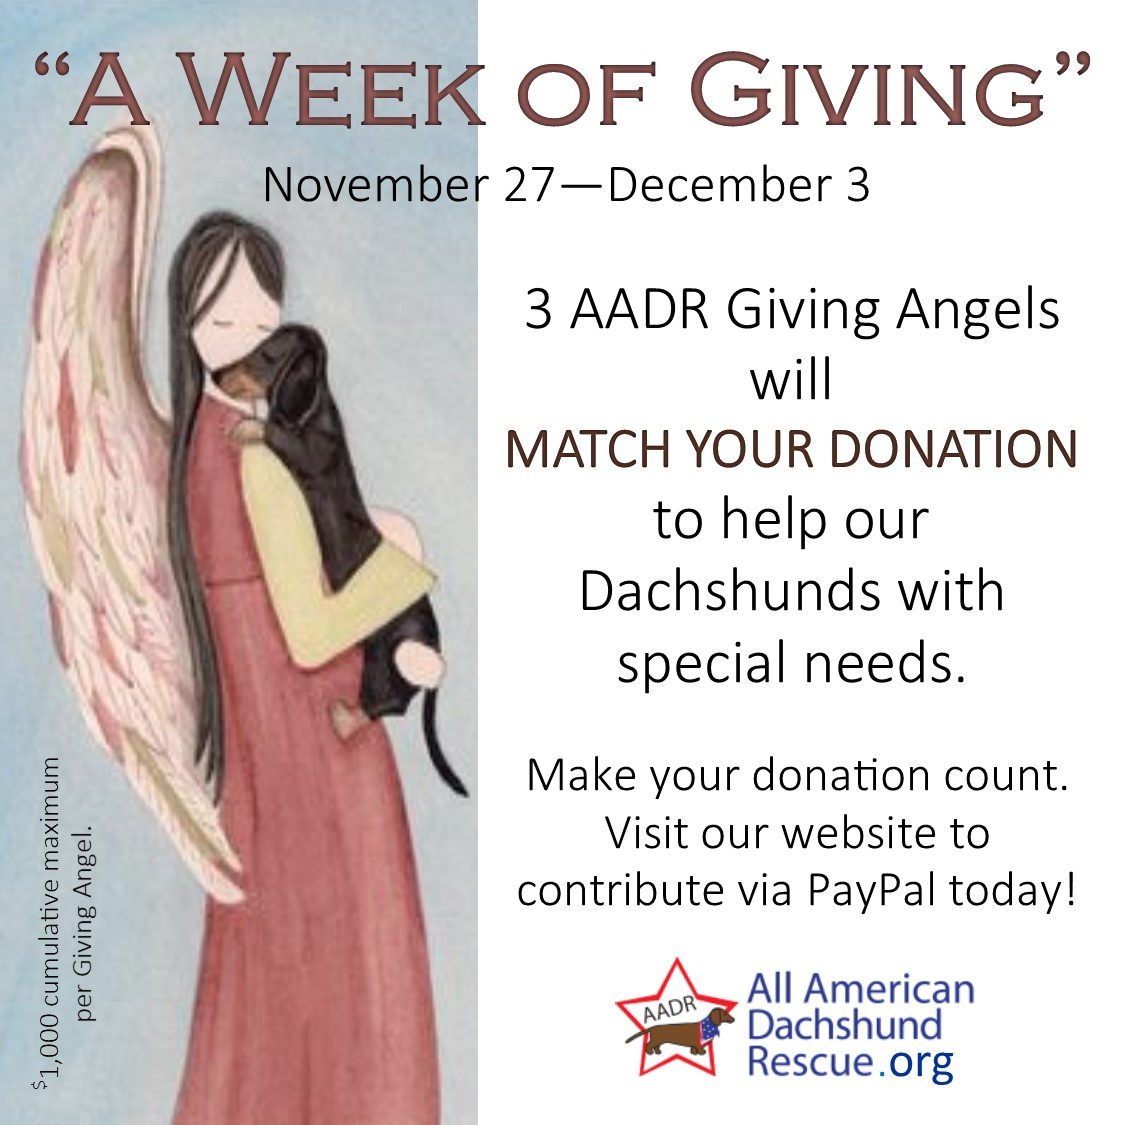 GivingPage